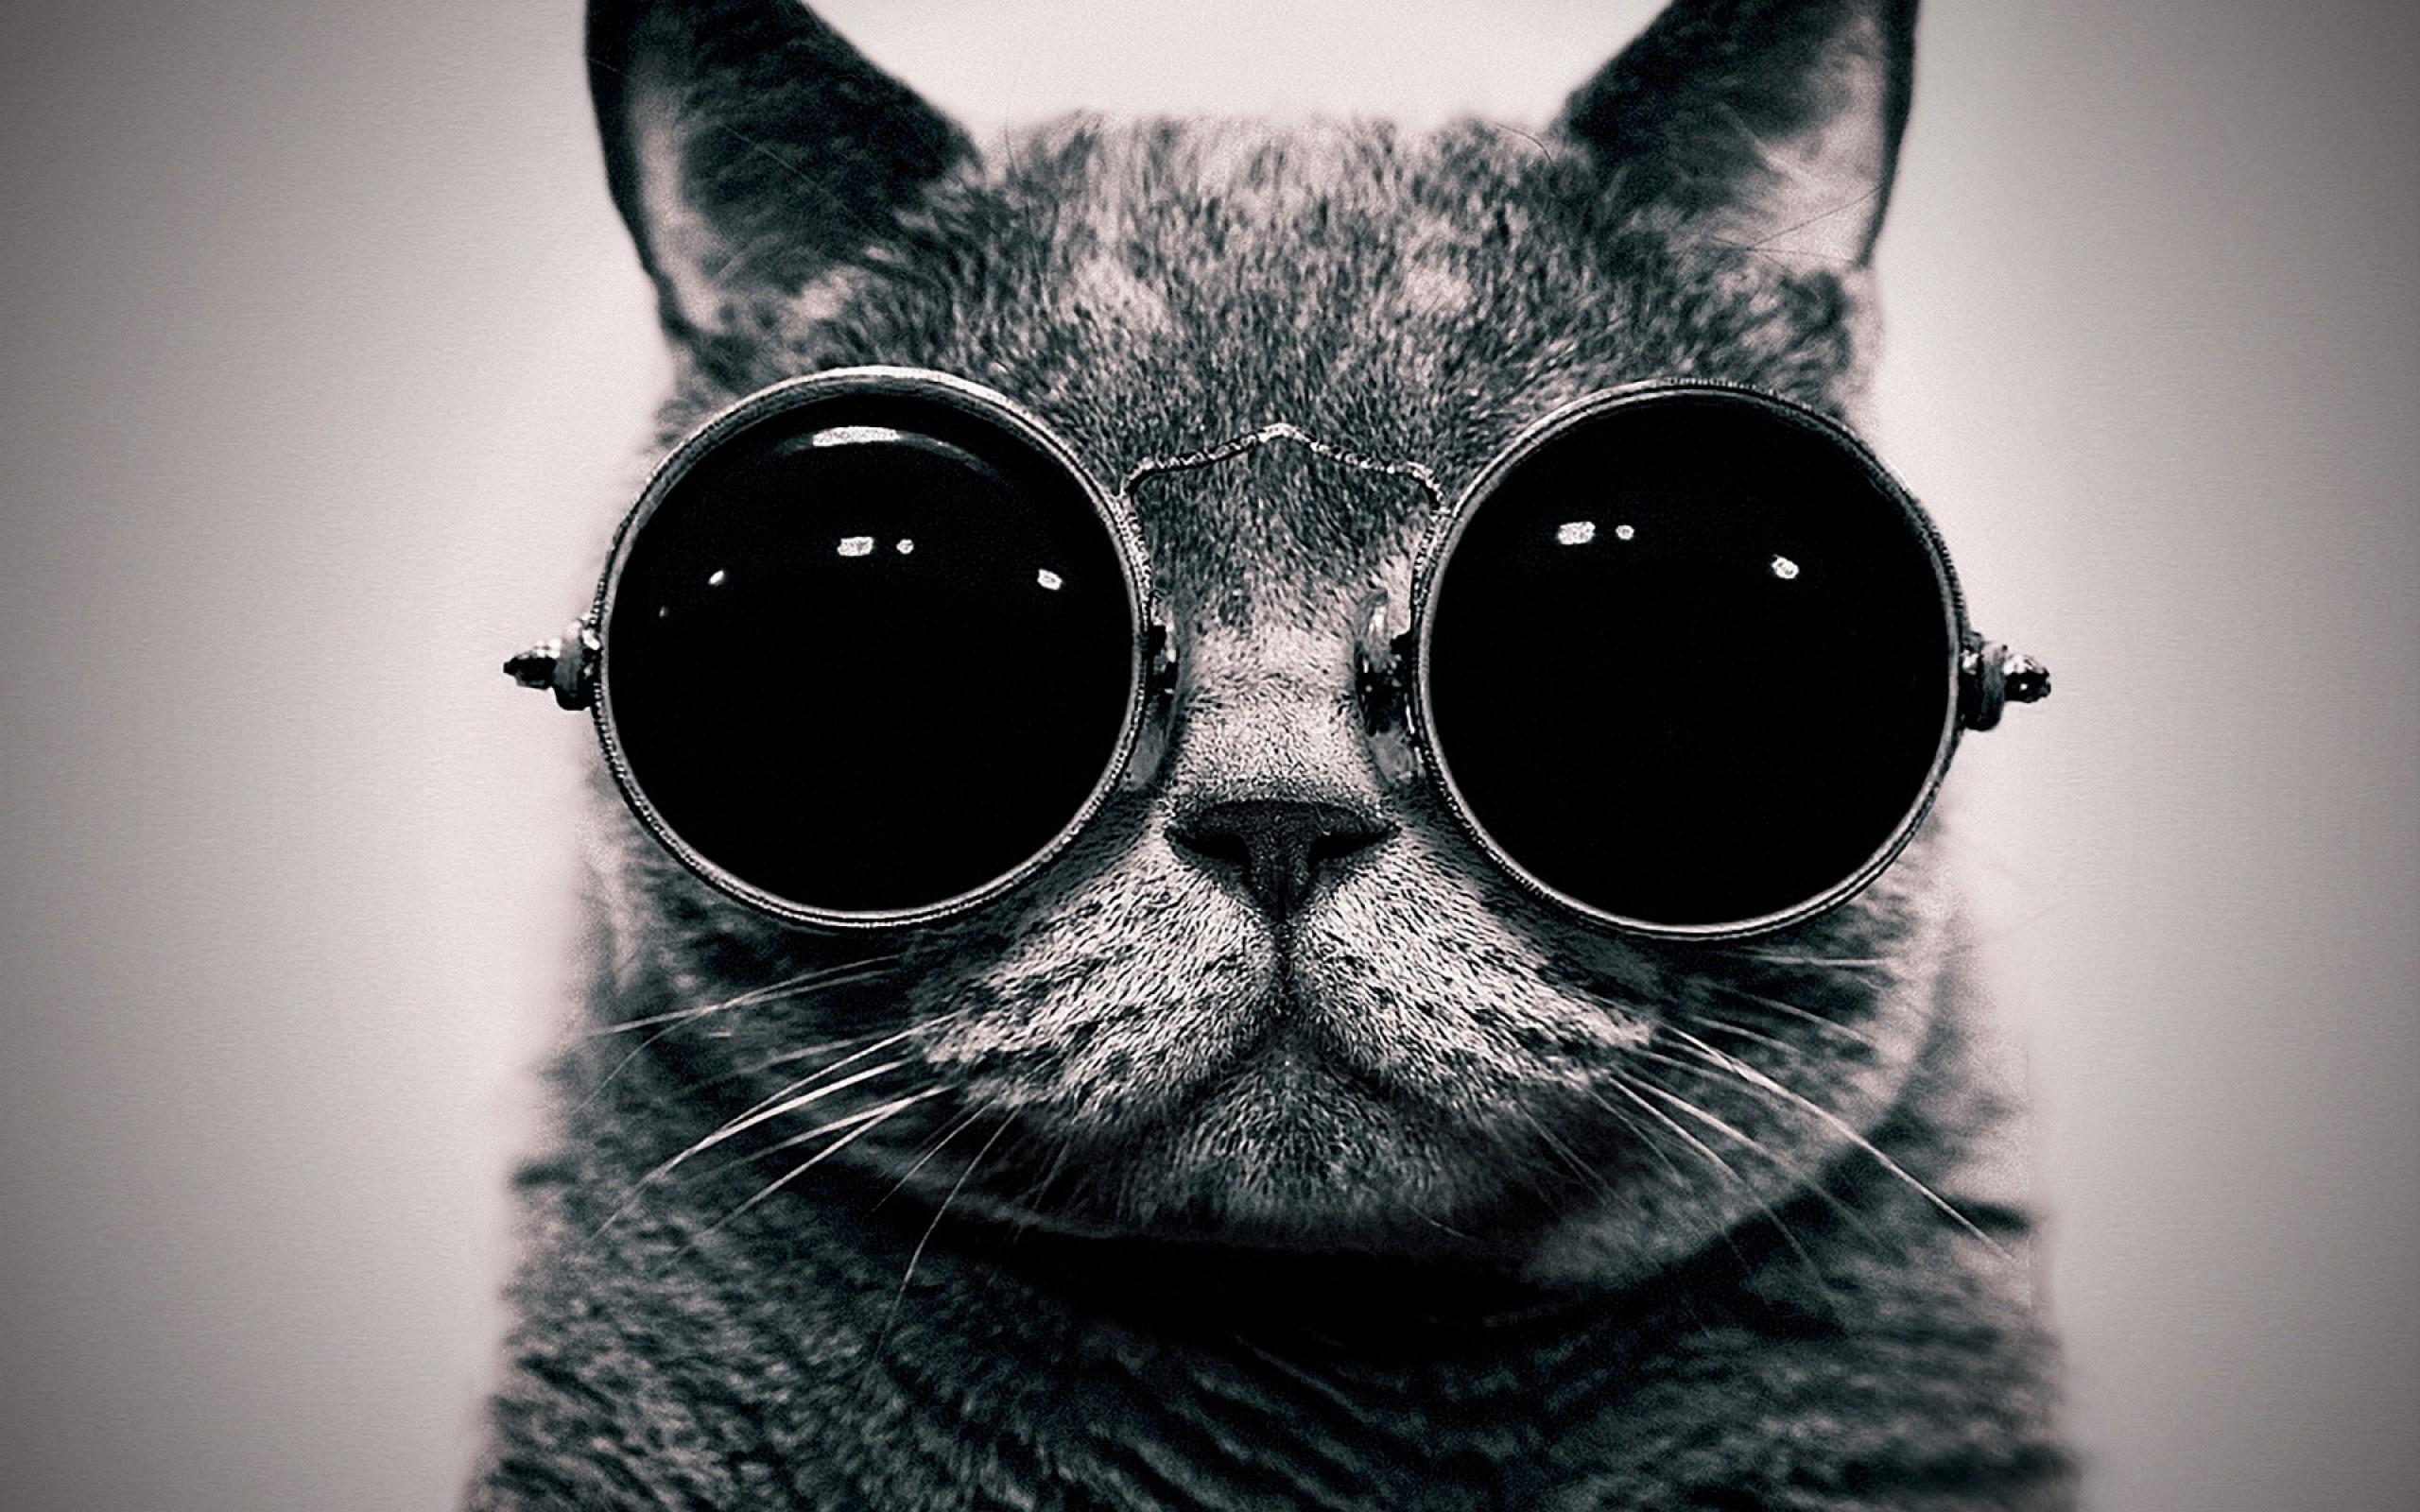 wallpaper-cat-in-the-glasses-2560x1600